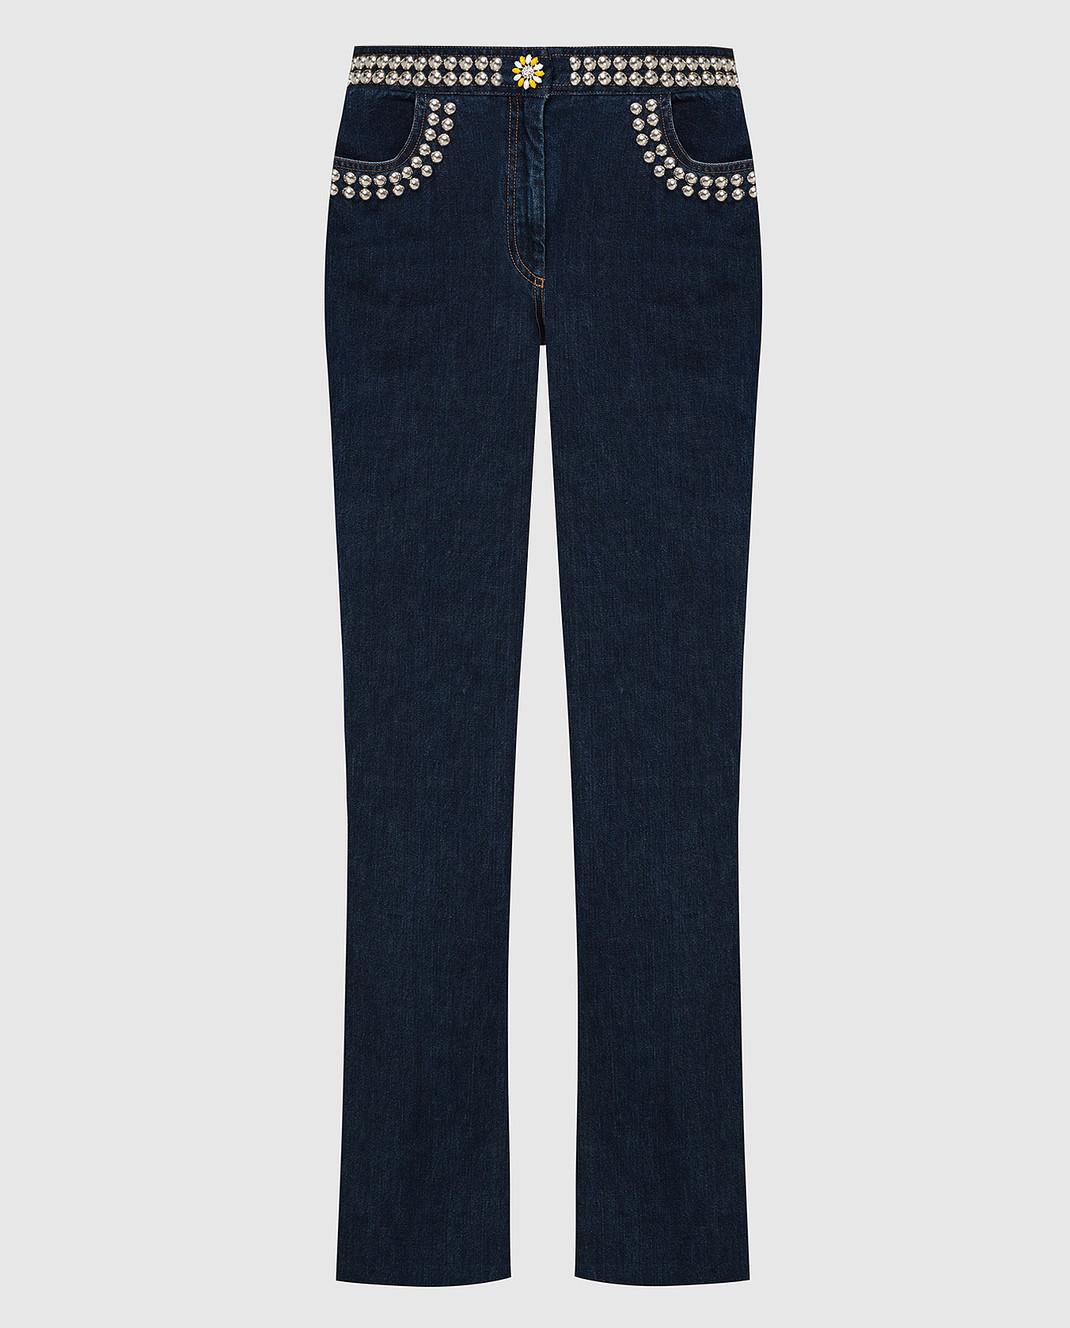 Miu Miu Темно-синие джинсы GWP192